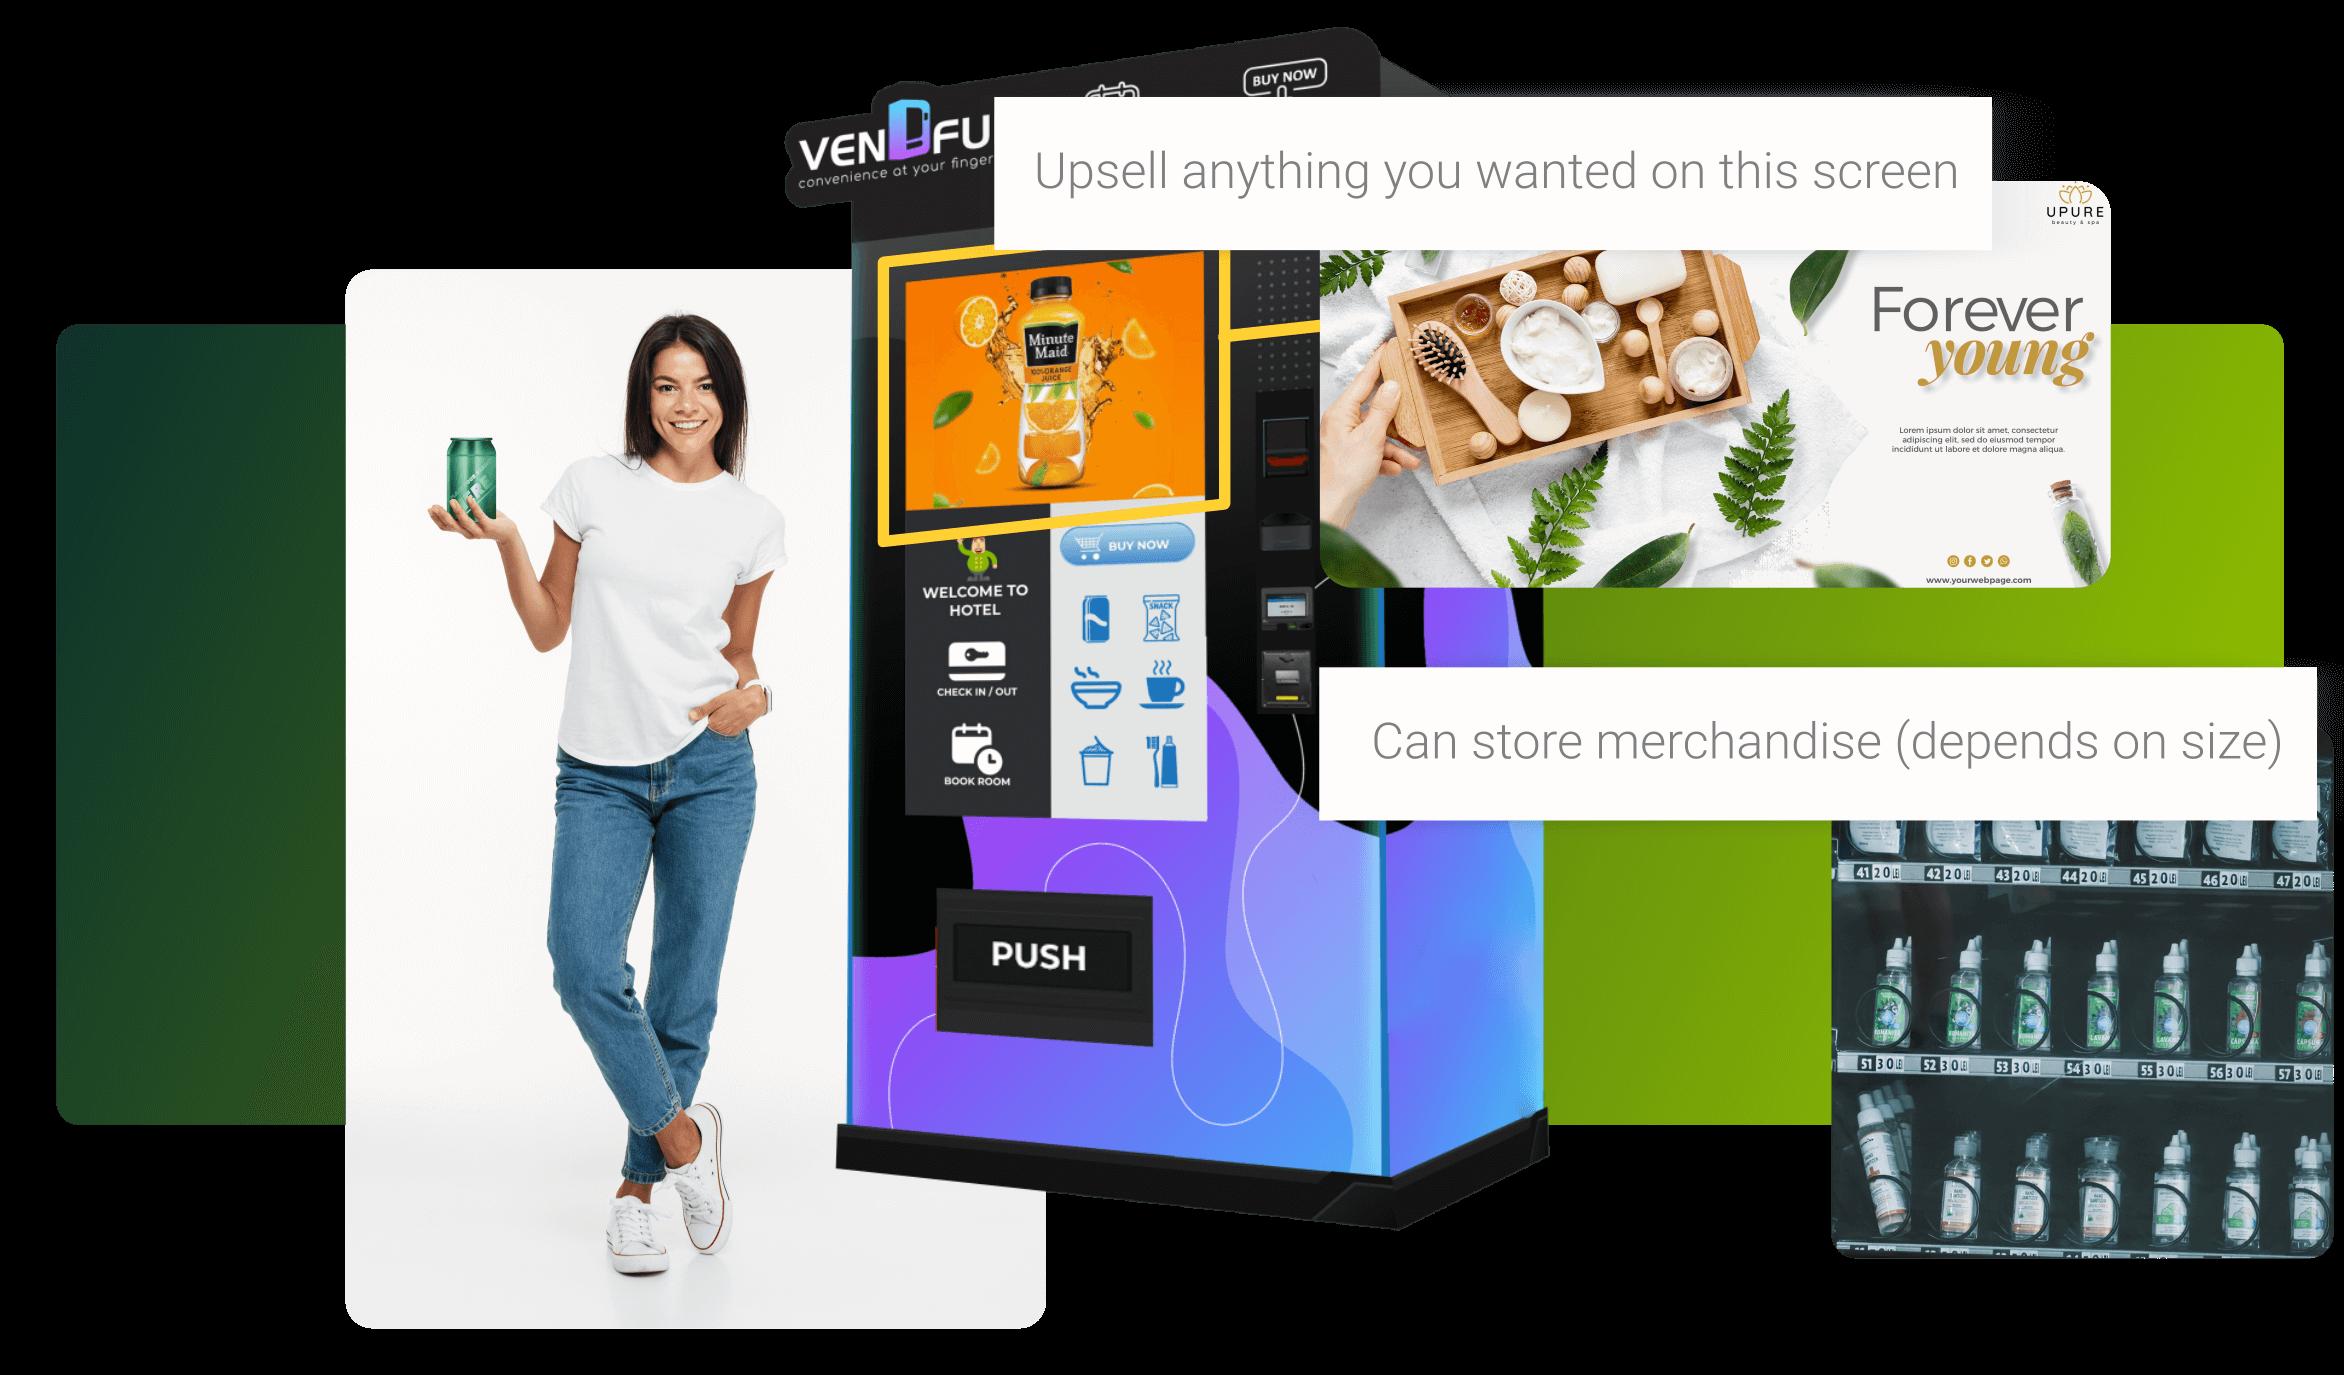 3_Vending Machine Mode-1